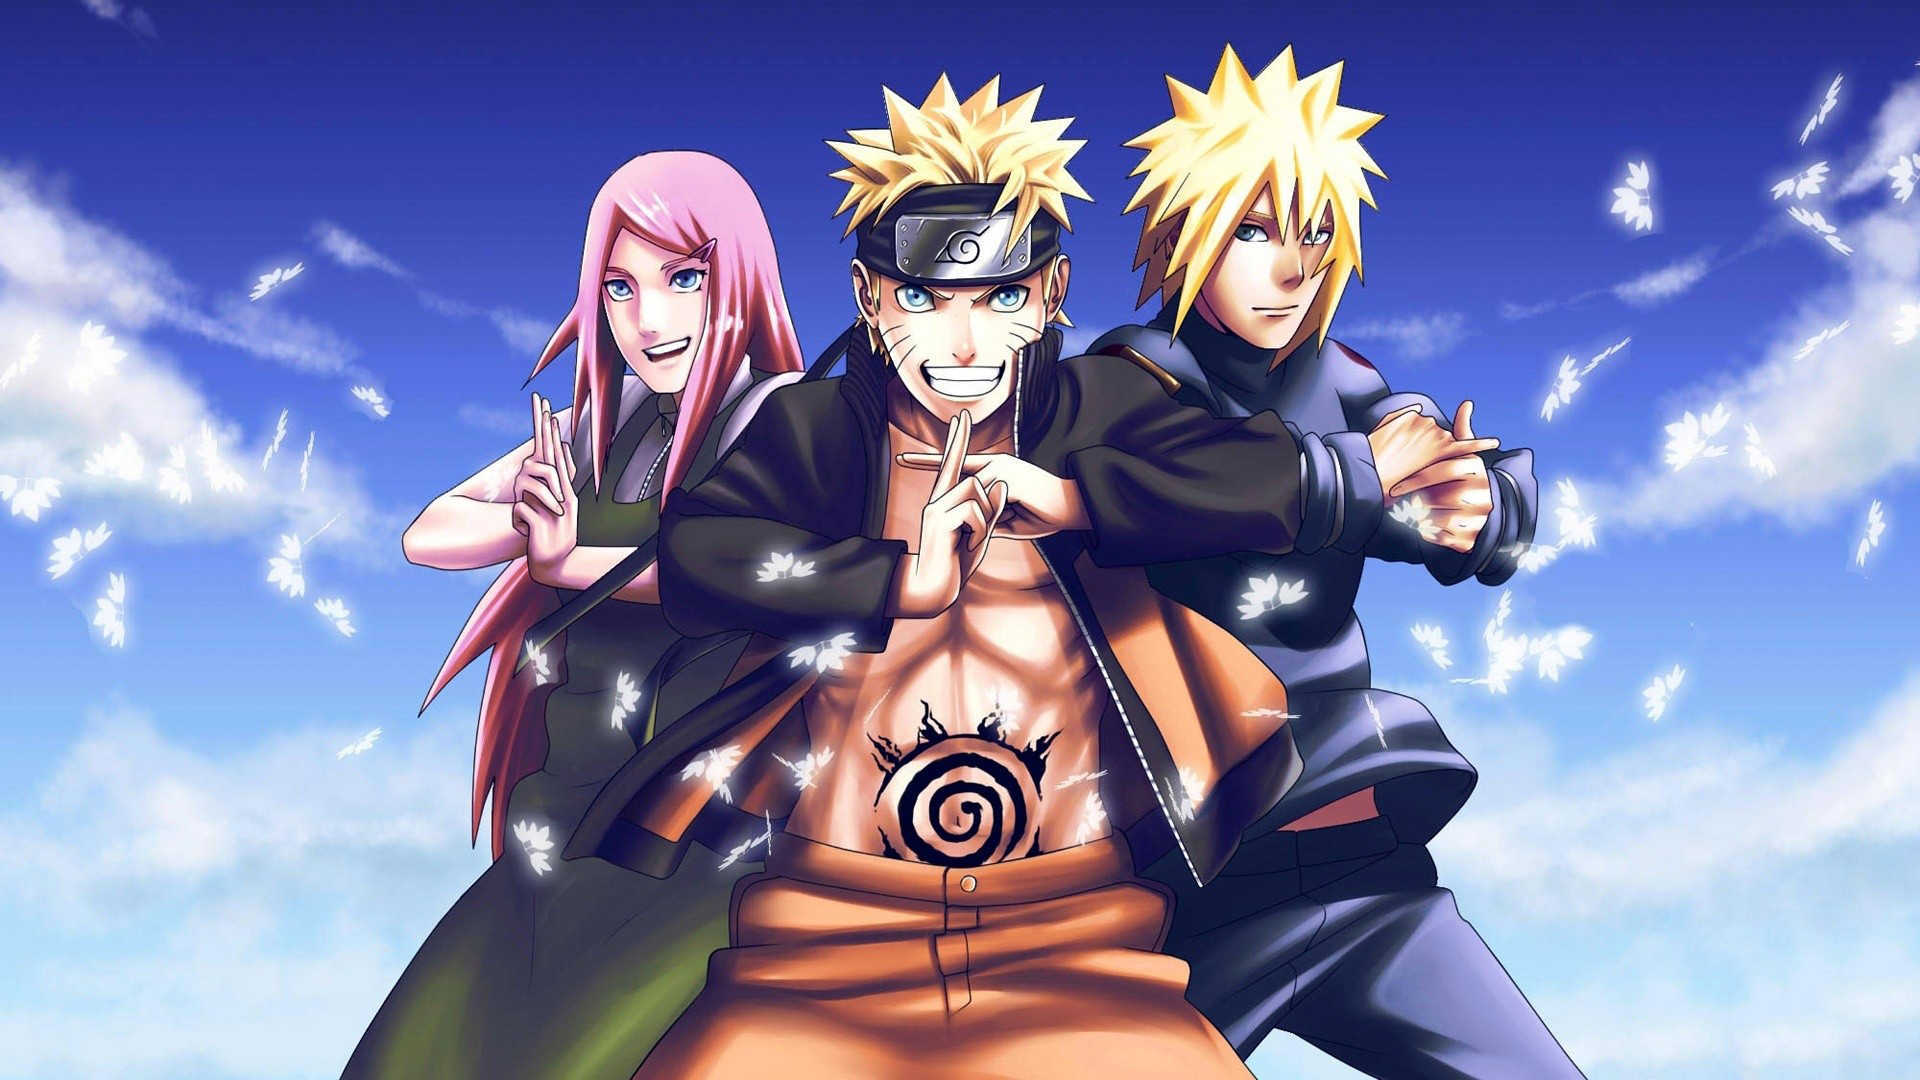 Naruto Wallpaper High Definition Hd Wallpaper Background Naruto